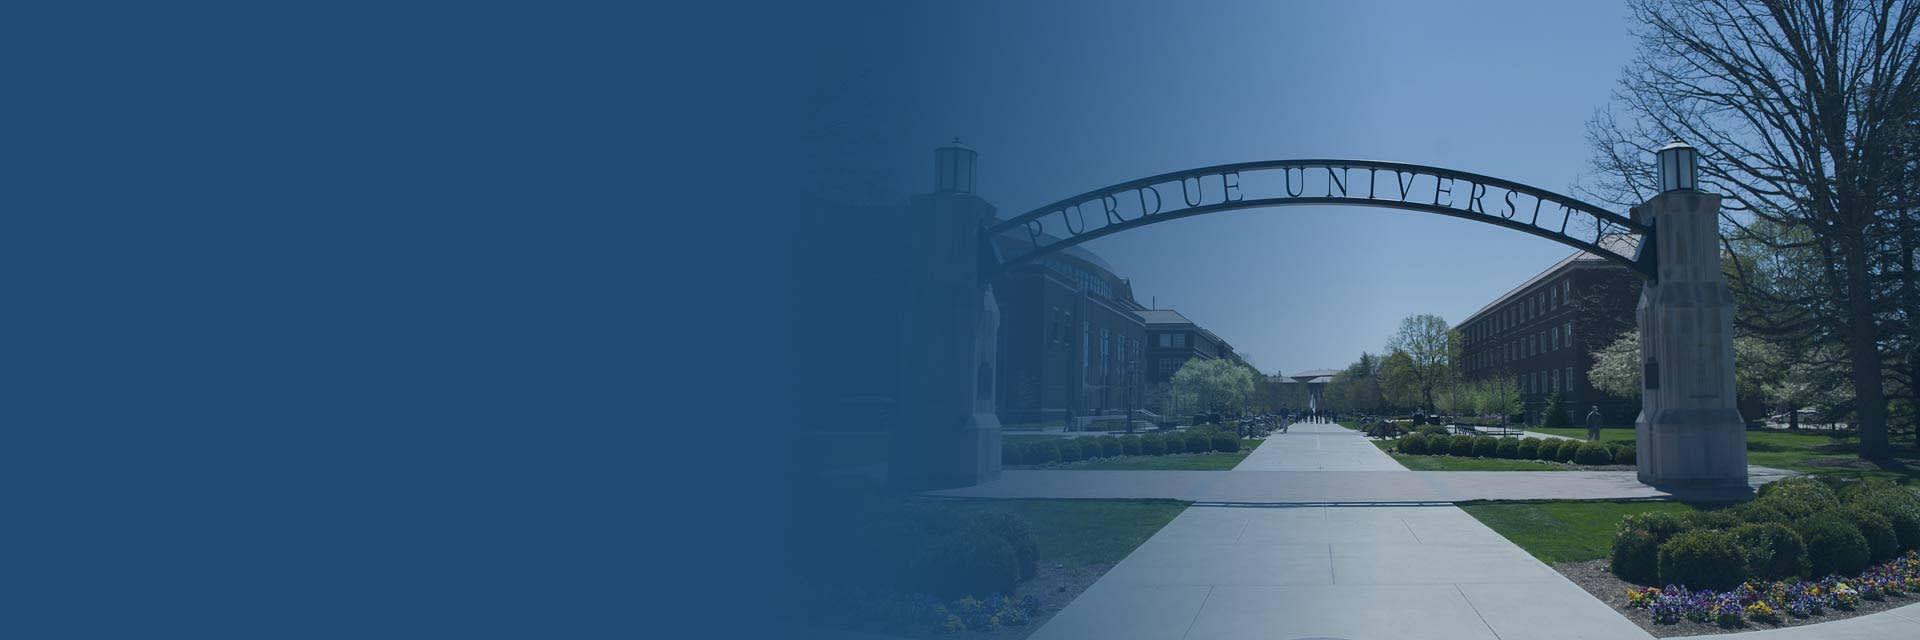 Post Graduate Program in Data Engineering